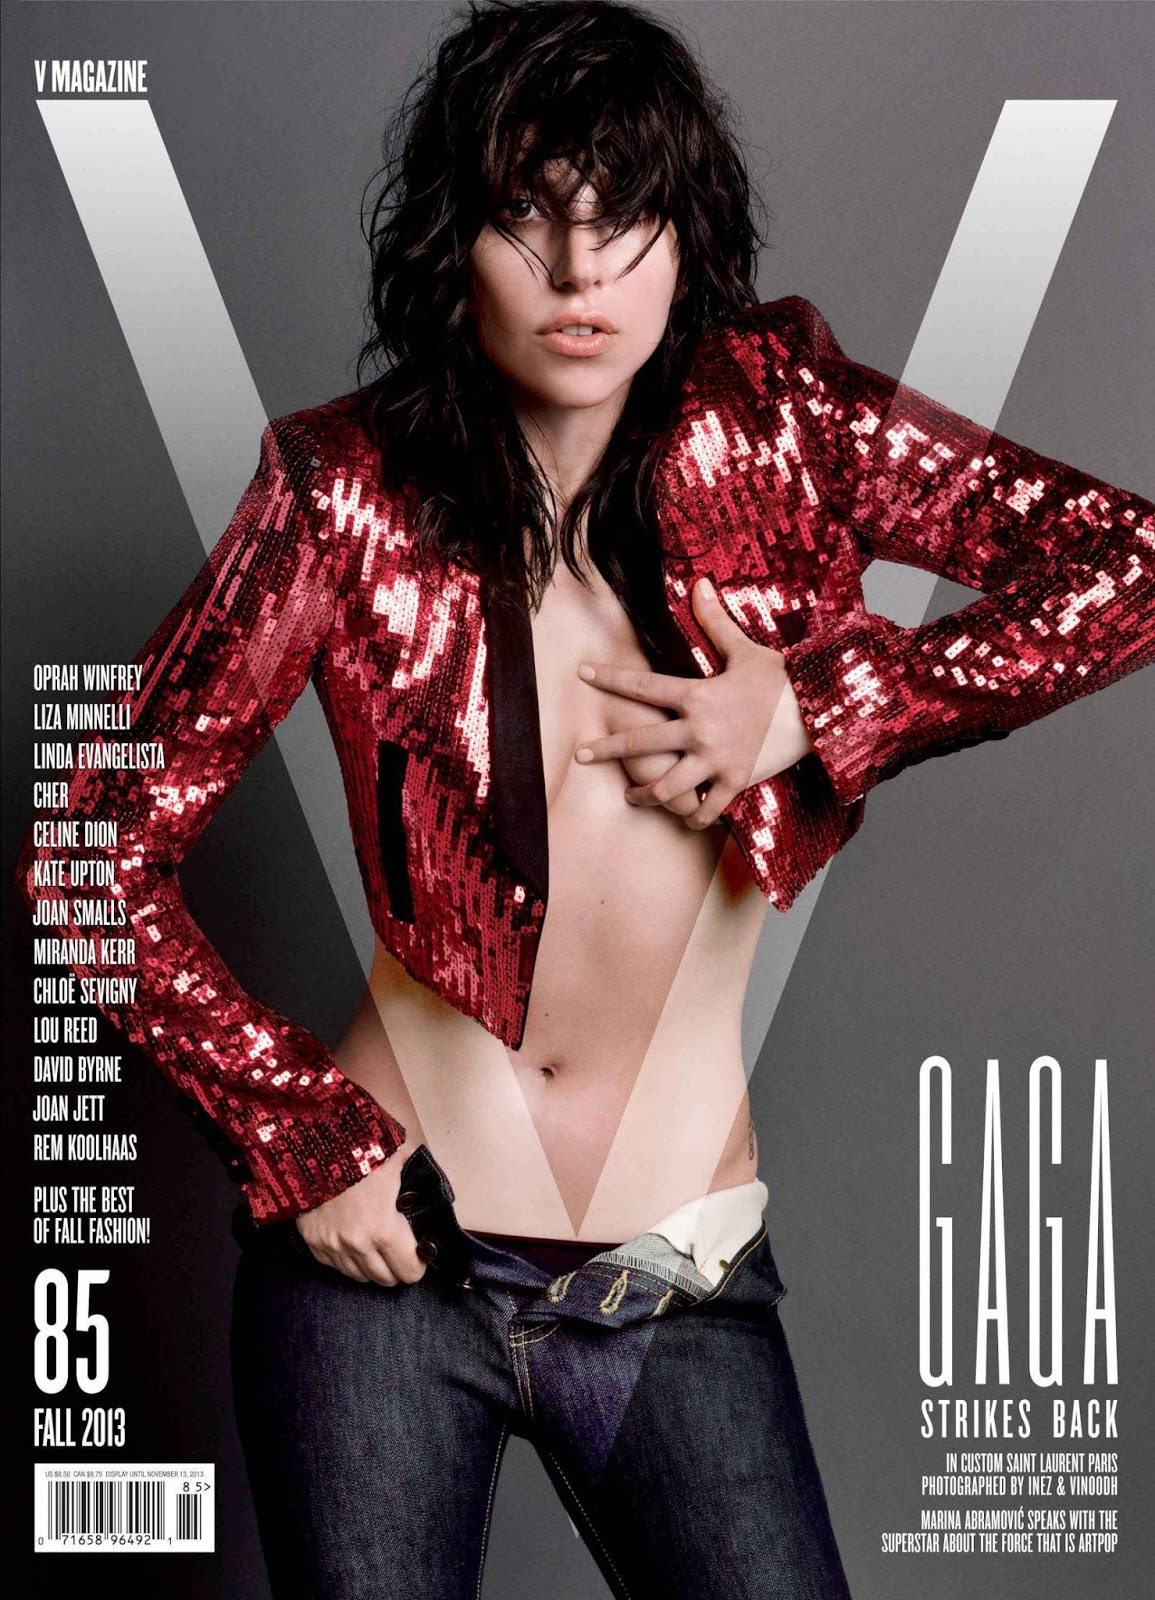 http://4.bp.blogspot.com/-wOlZv7St6cM/UhZnPtTY6rI/AAAAAAAANso/GJ71GLOkNDA/s1600/Lady-Gaga-7.jpg